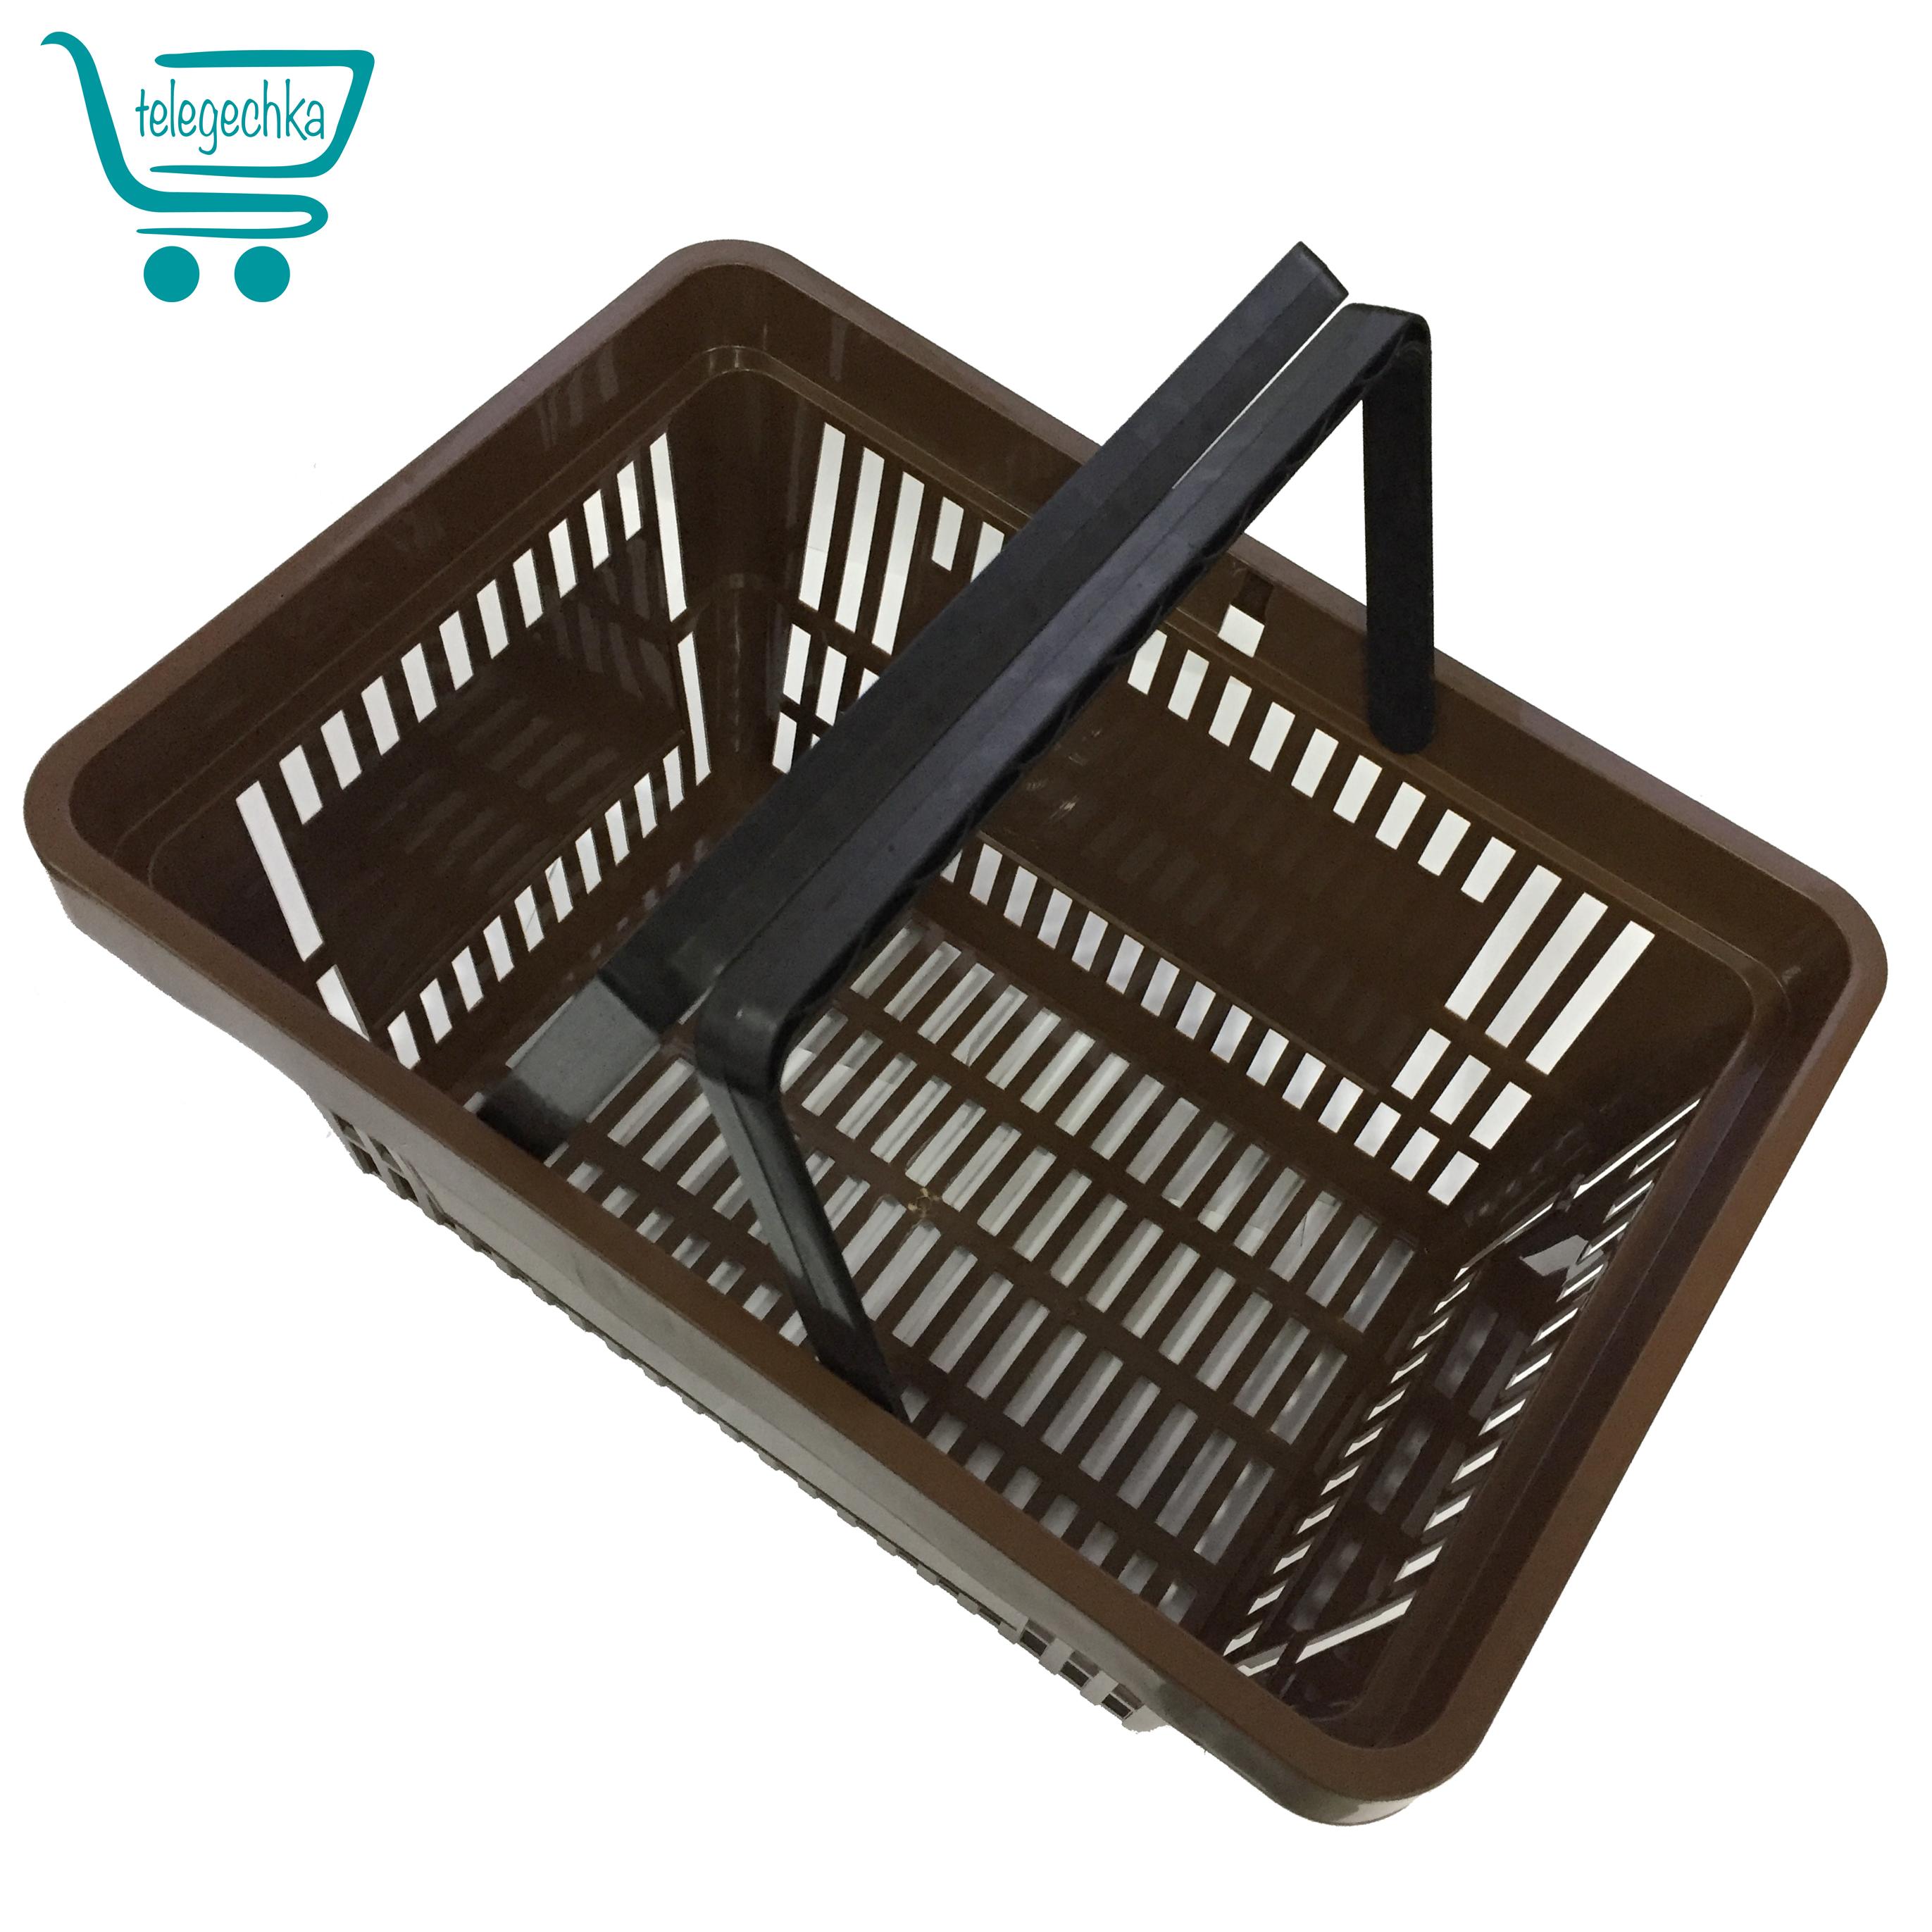 Покупательские корзины для супермаркета Plast 22 Brown Roshe